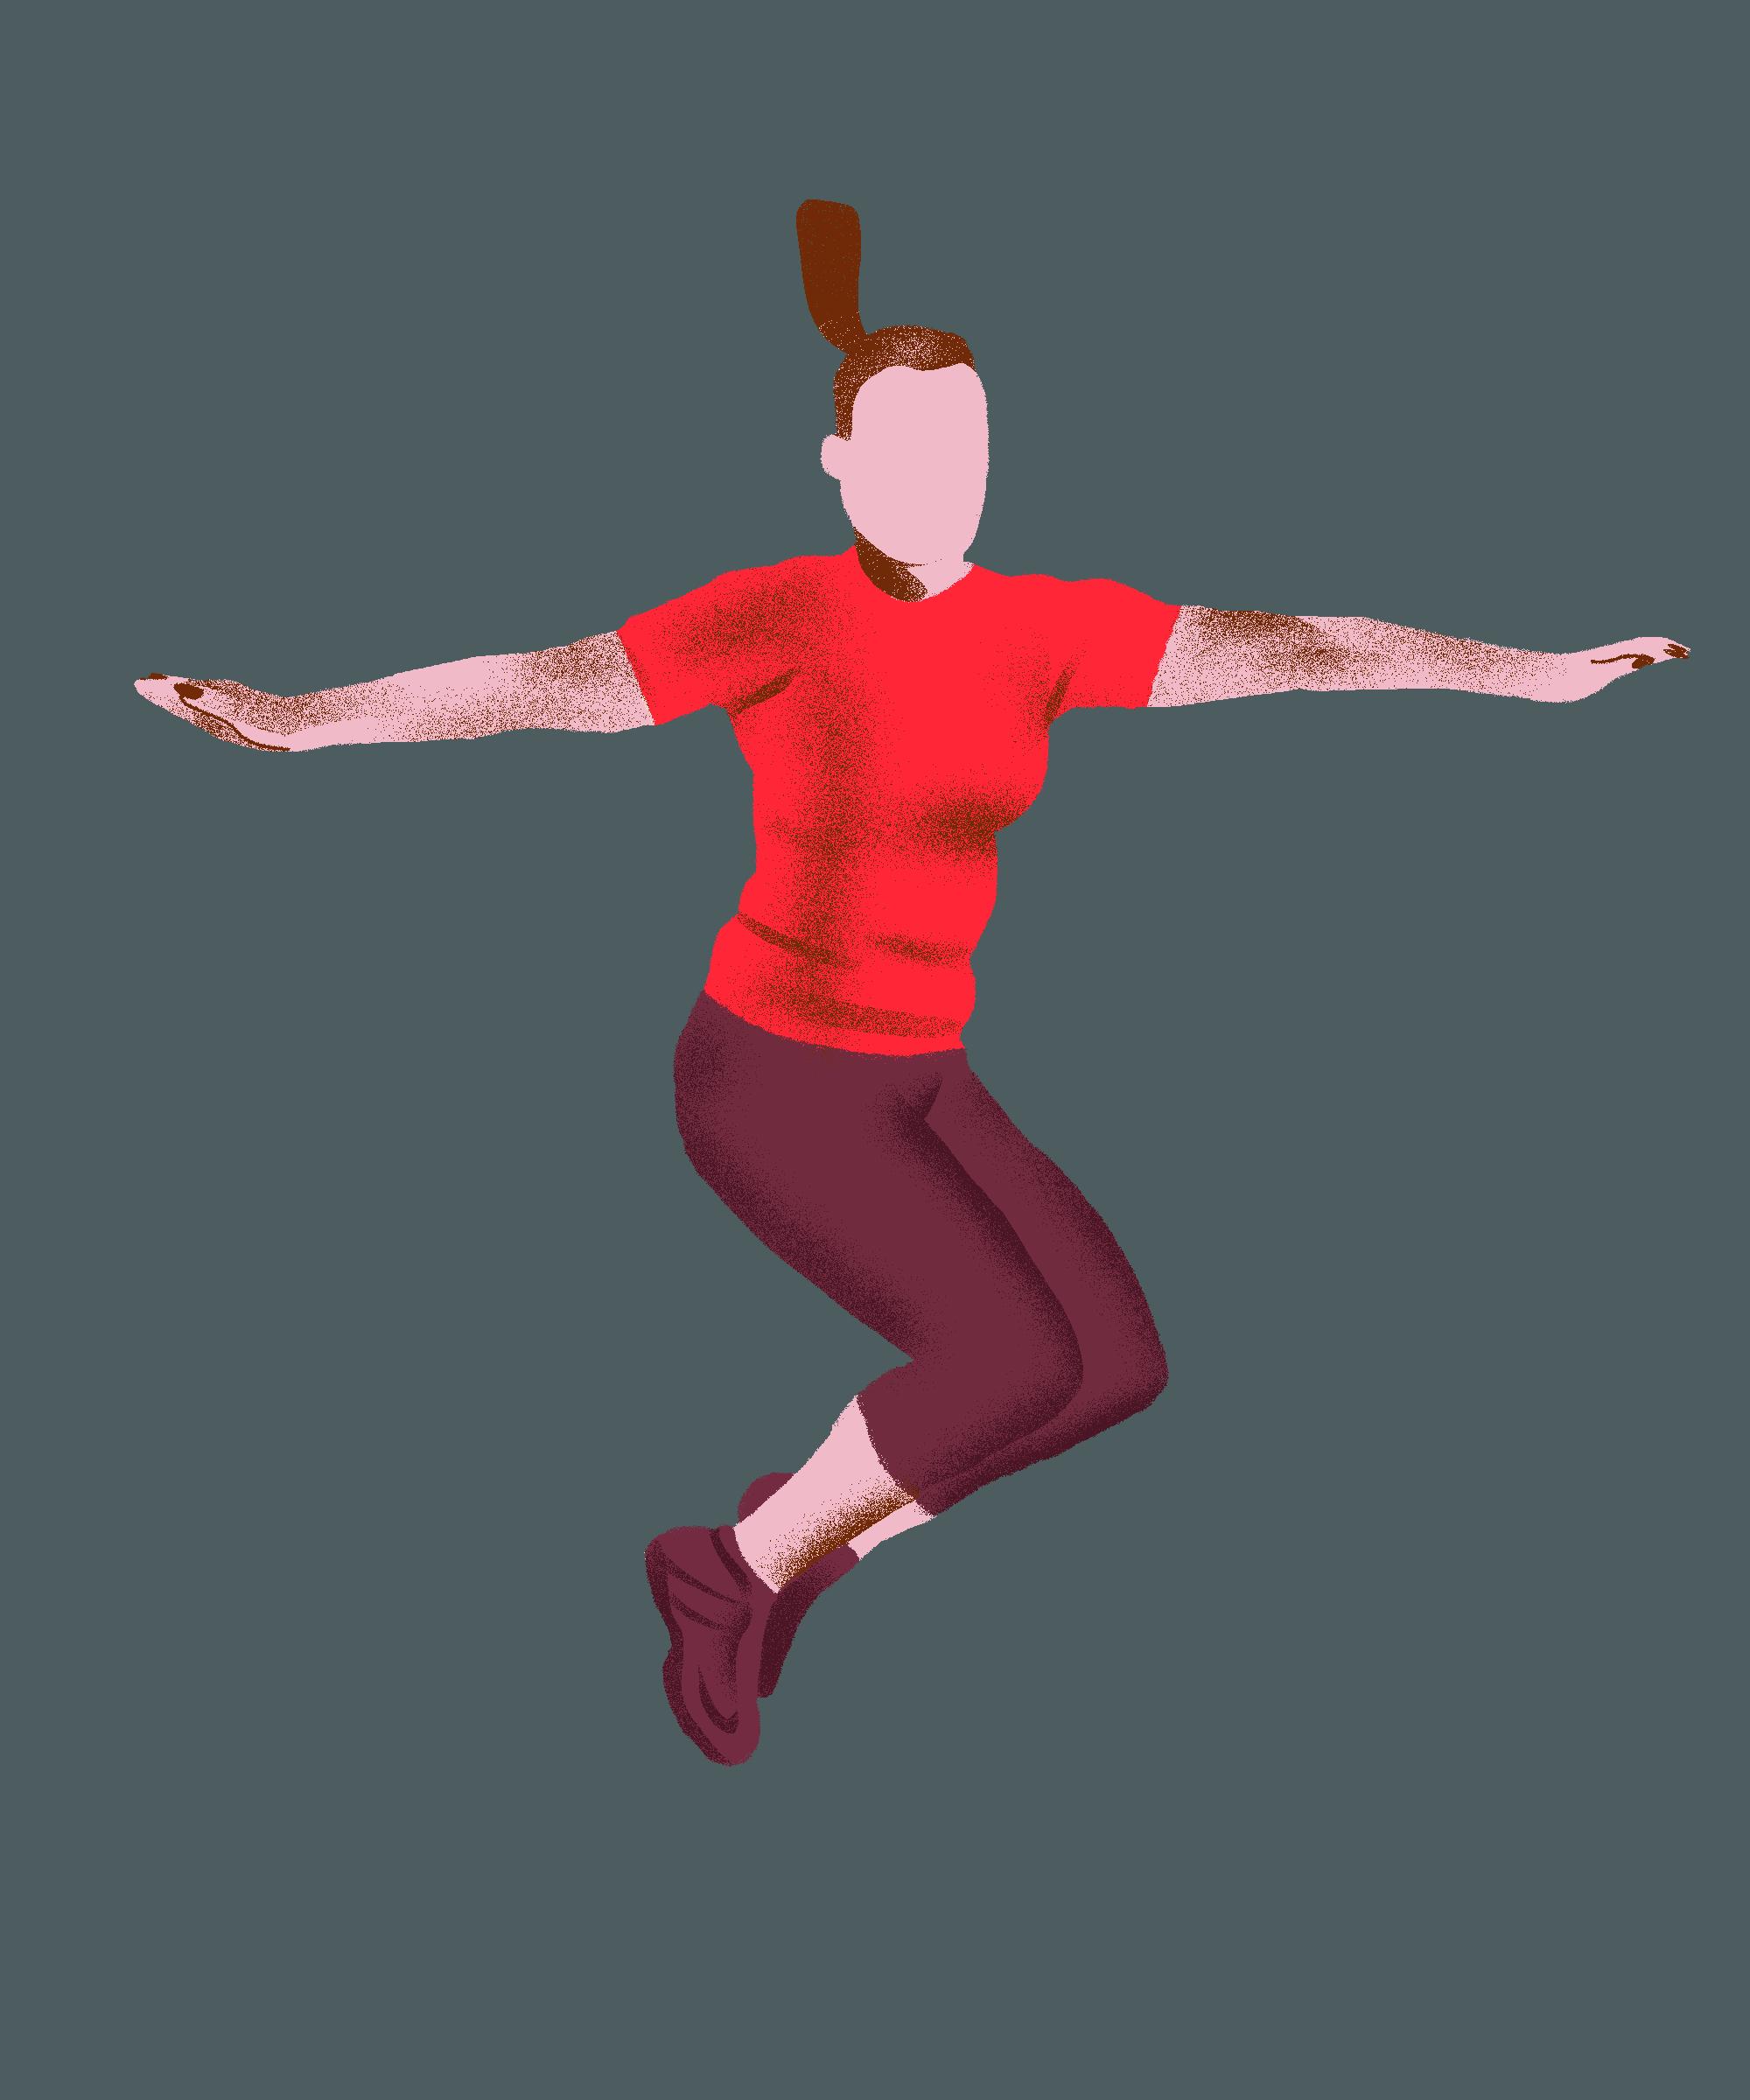 Joyful Movement Week 3: Get Ready To Jump For Joy — Literally